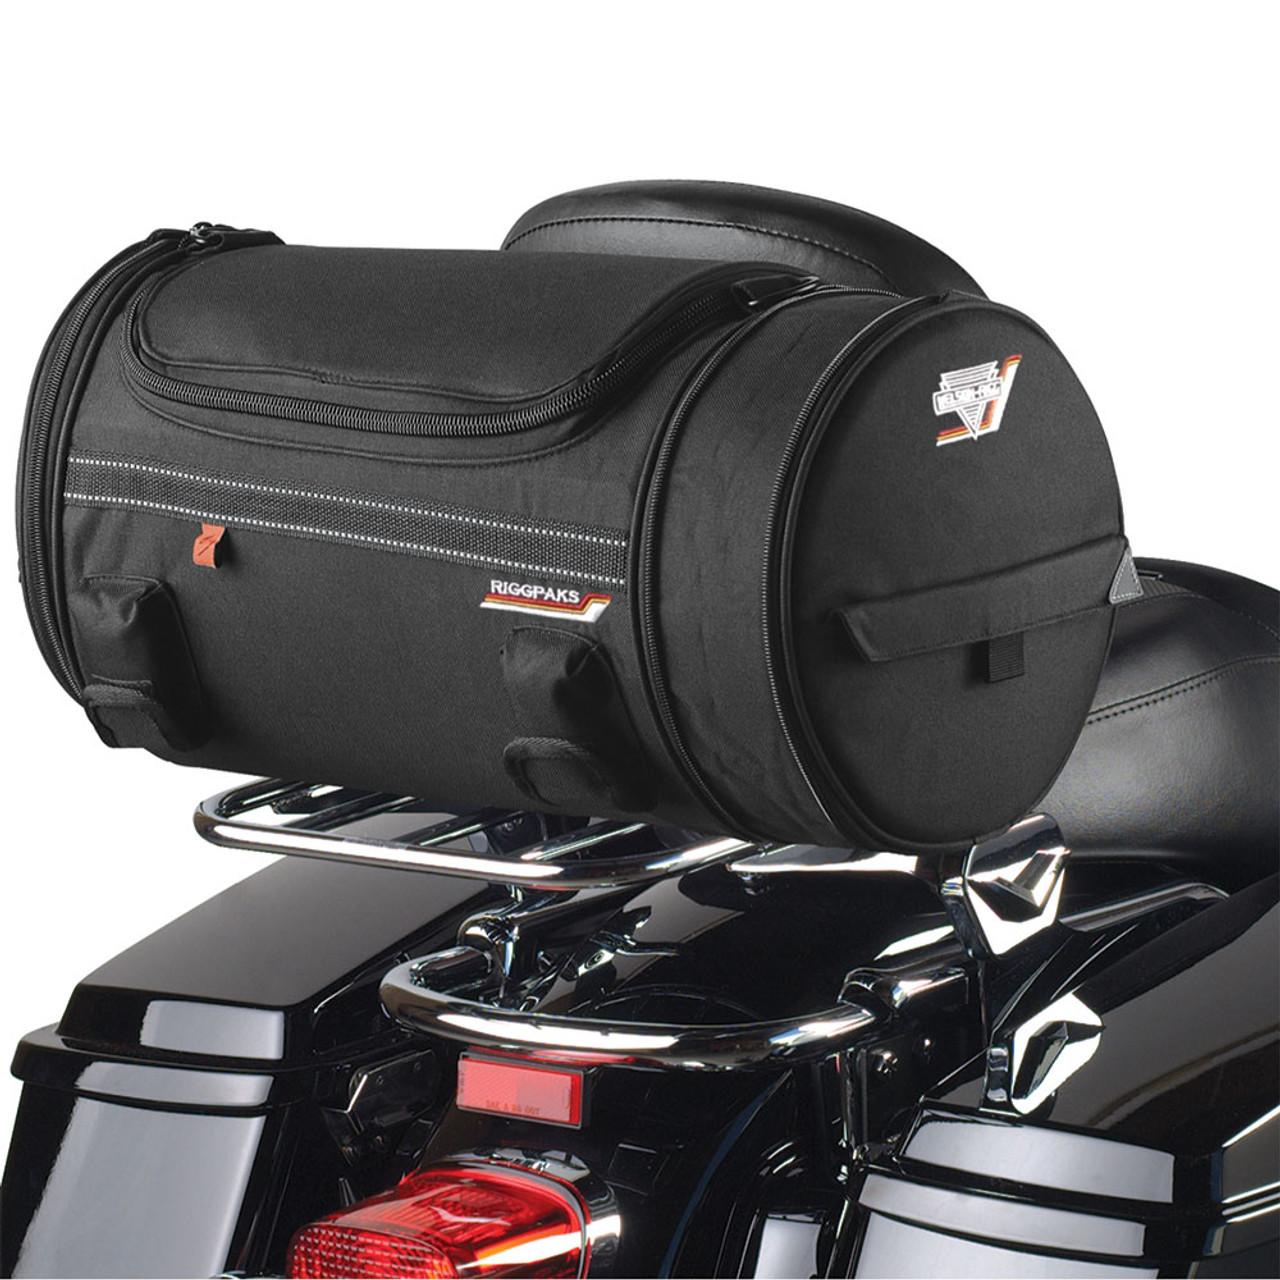 Nelson-Rigg Rollbag CTB250 Black